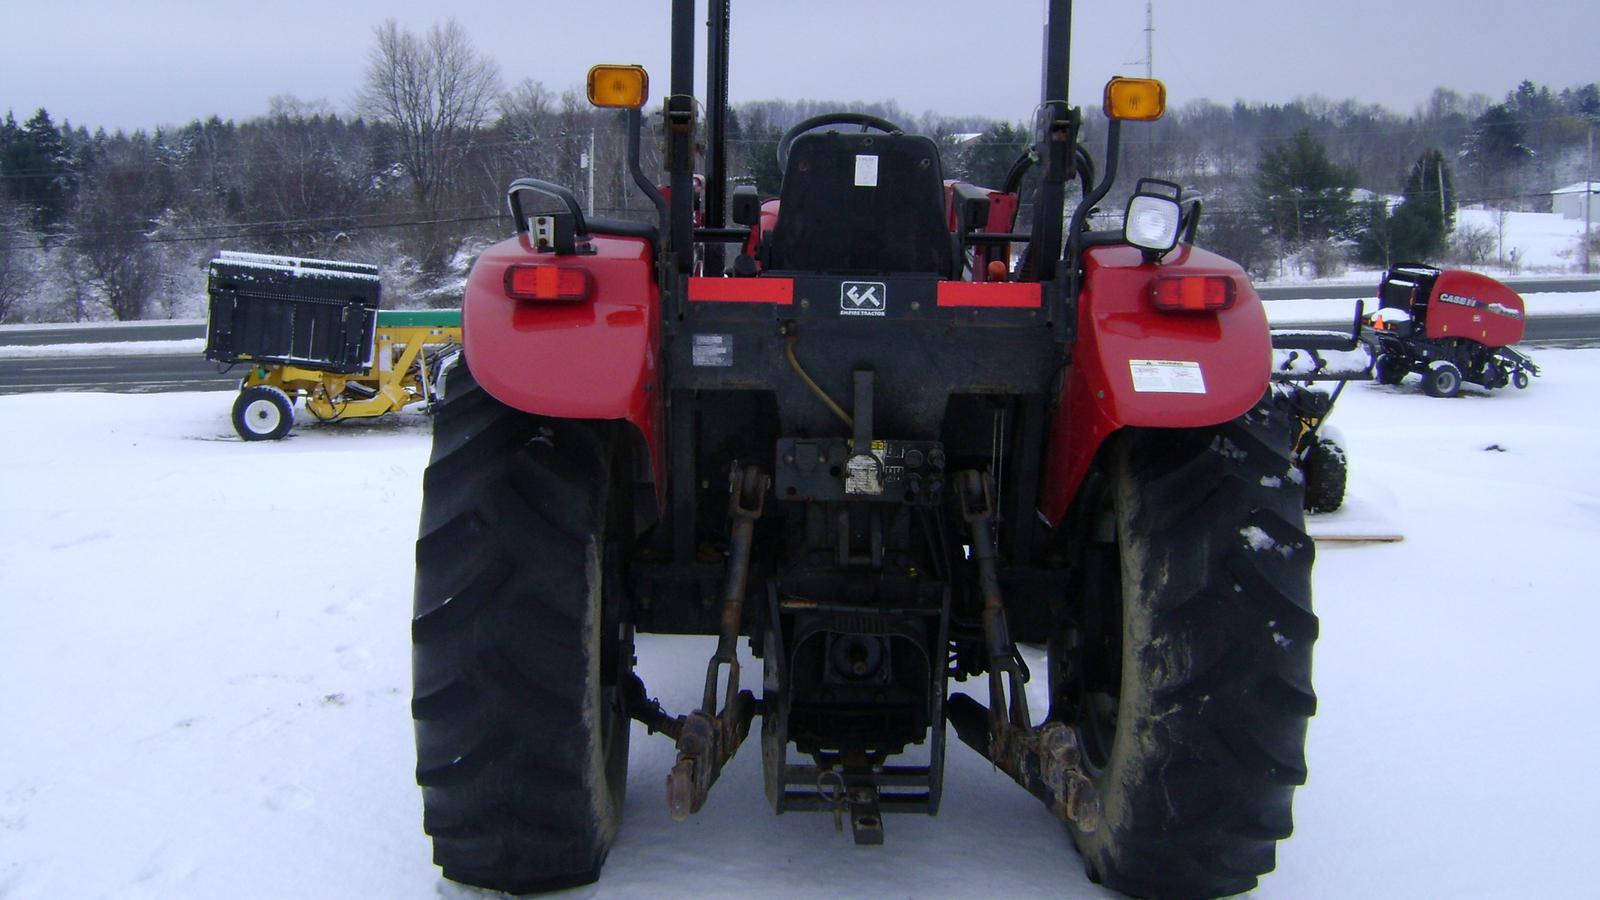 Z62600 Case IH JX60 Tractor (3) (1) case ih jx60 for sale in cazenovia, ny empire tractor, inc